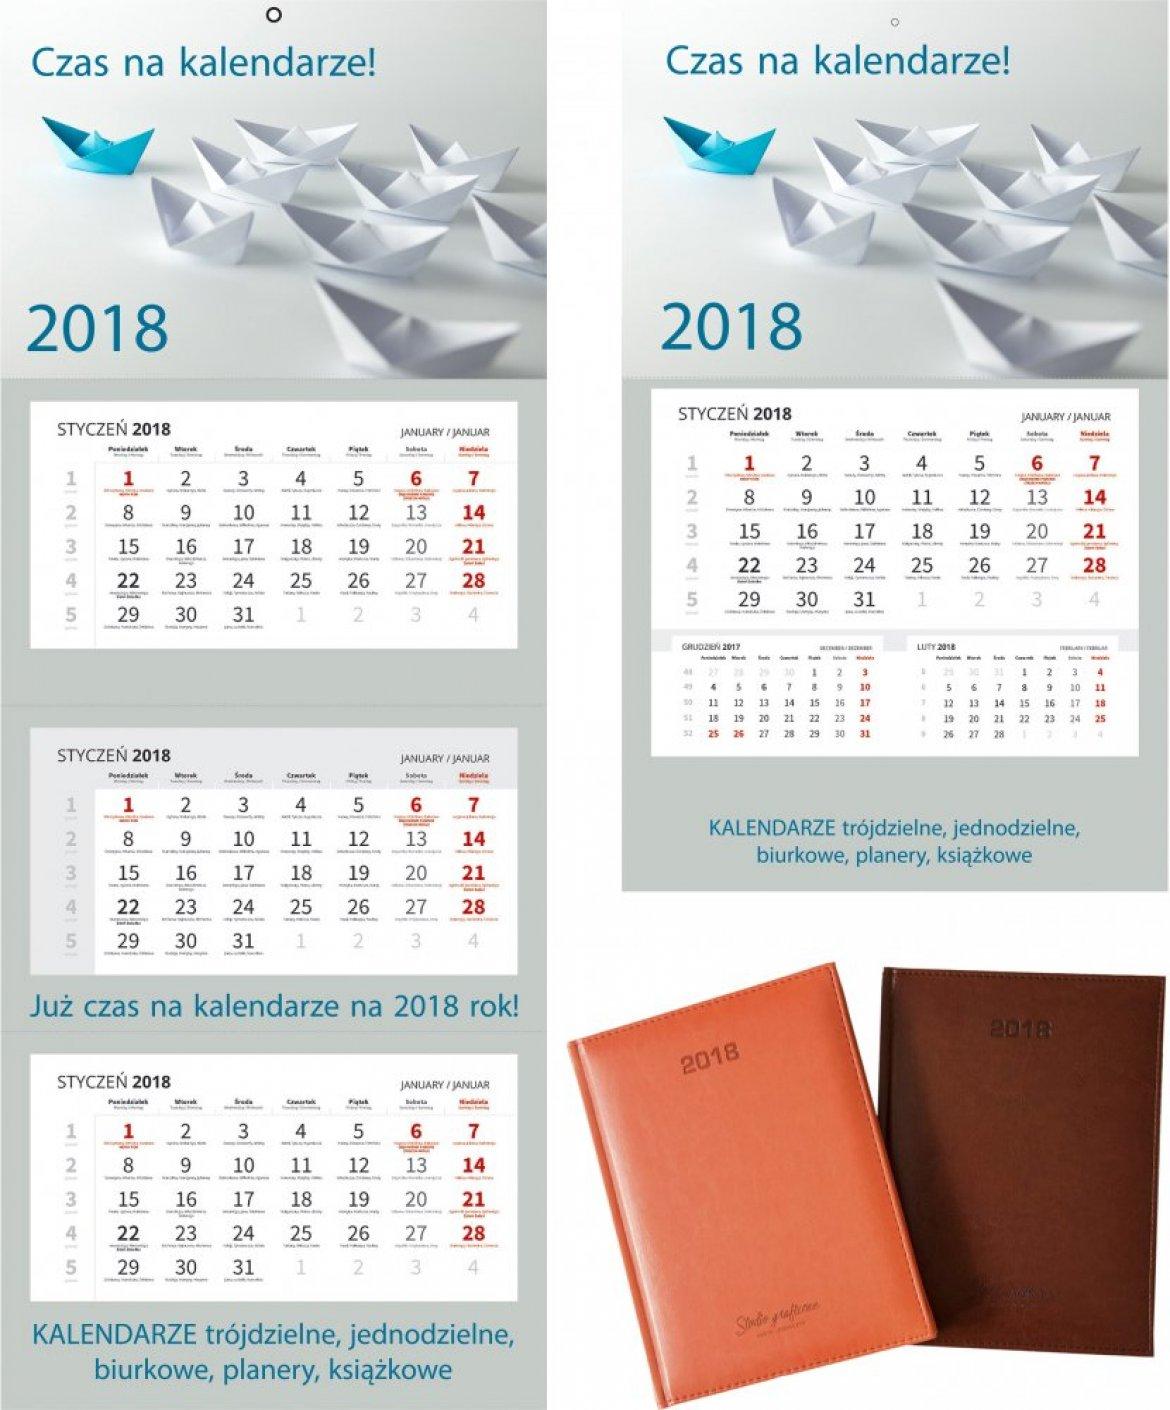 /thumbs/1170xauto/2017-12::1512585989-kalendarze1.jpg